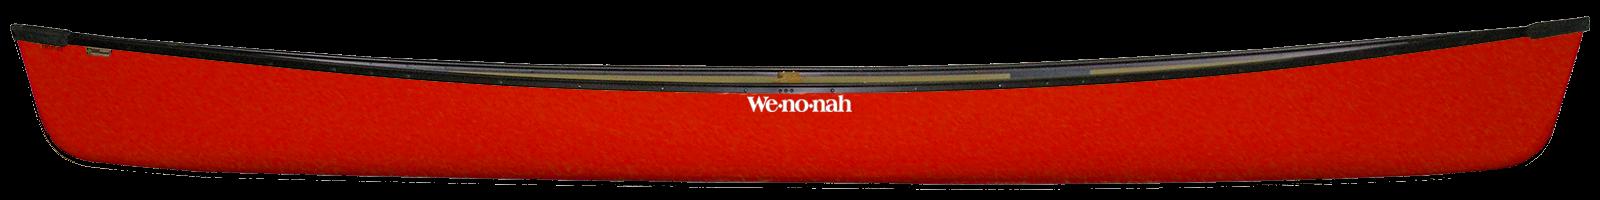 Wenonah Adirondack - ORDER NEW